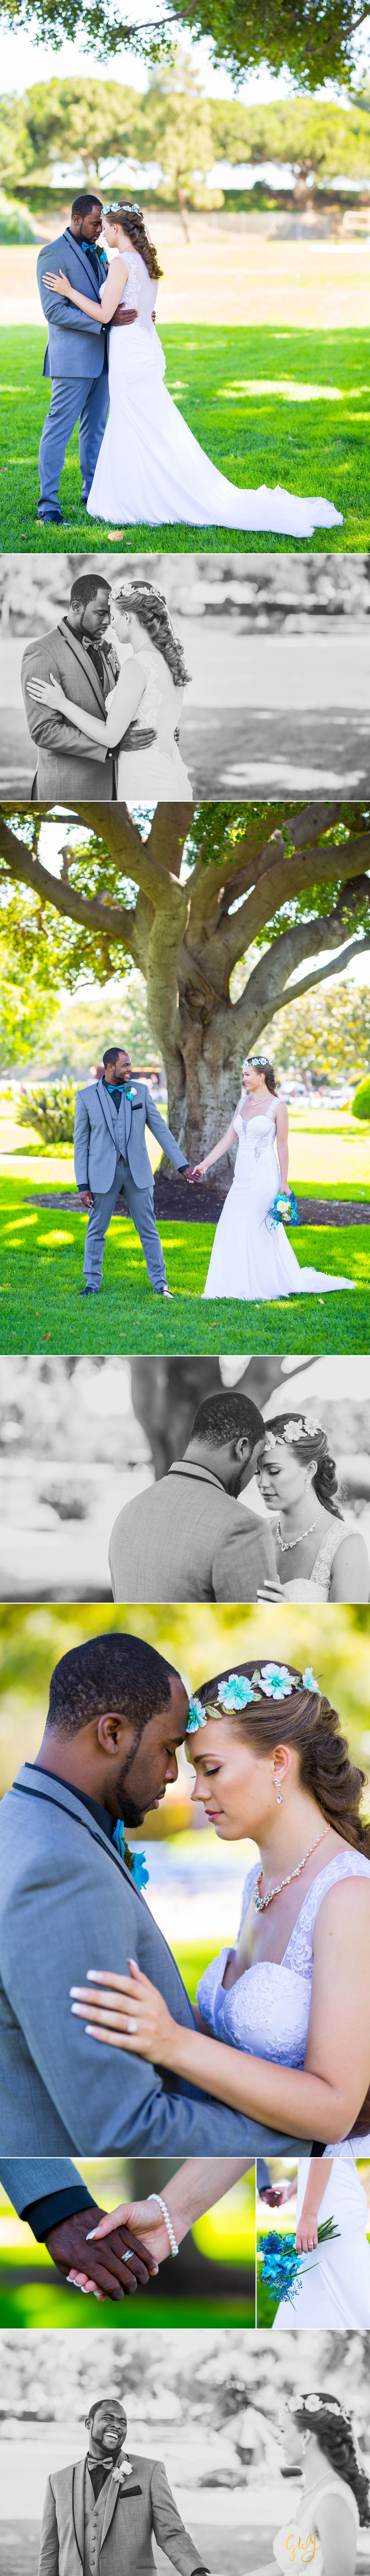 Rebecca + Torand El Segundo Chevron Employee Park Summer Barbados Bajan Wedding by Glass Woods Media 8.jpg